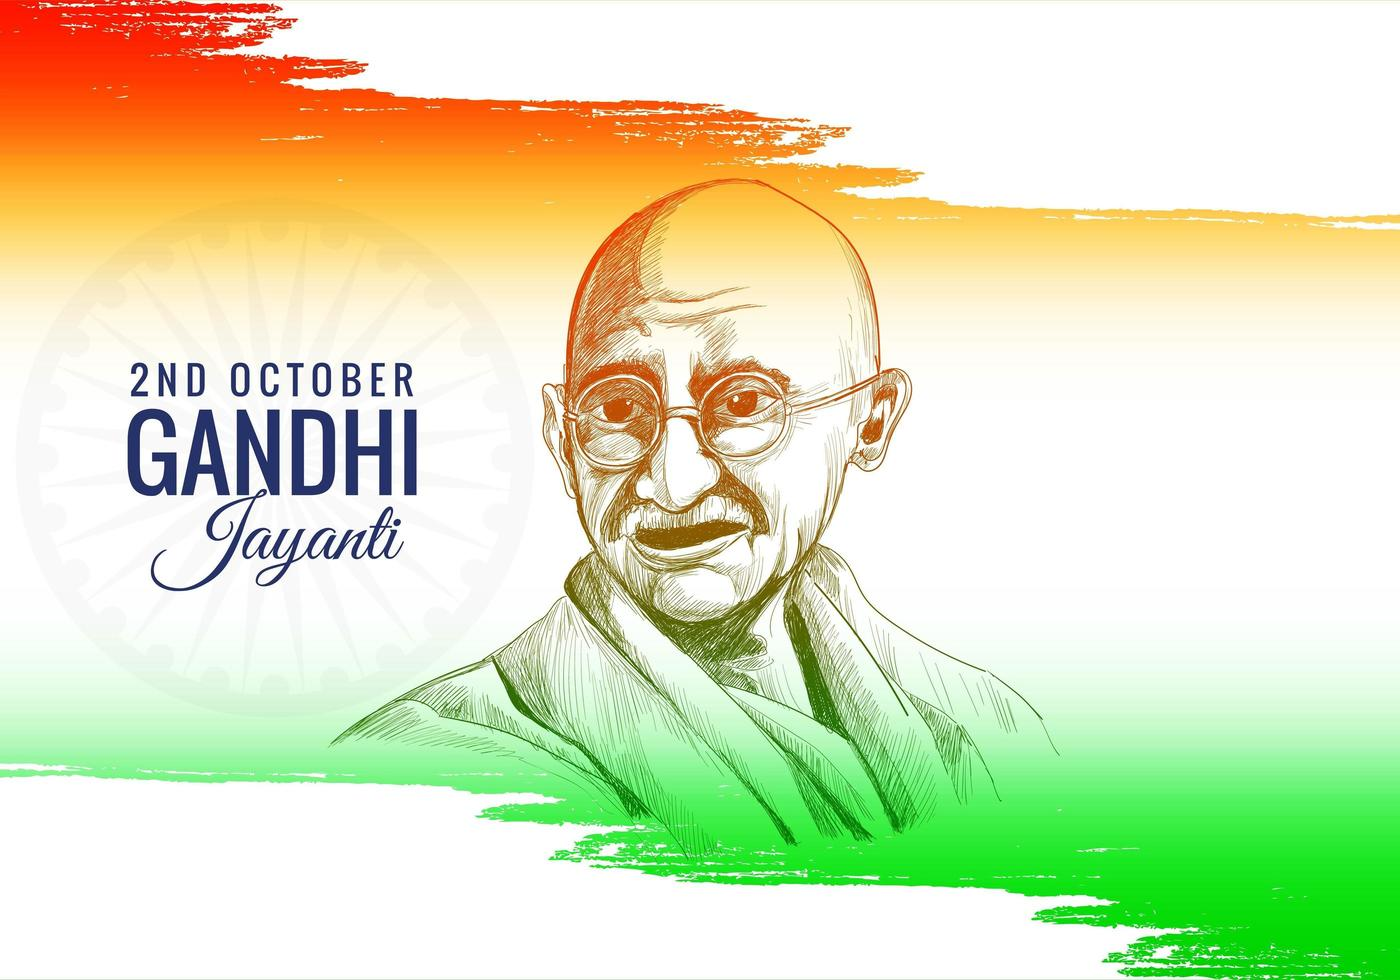 gandhi jayanti celebrado como fondo de fiesta nacional vector